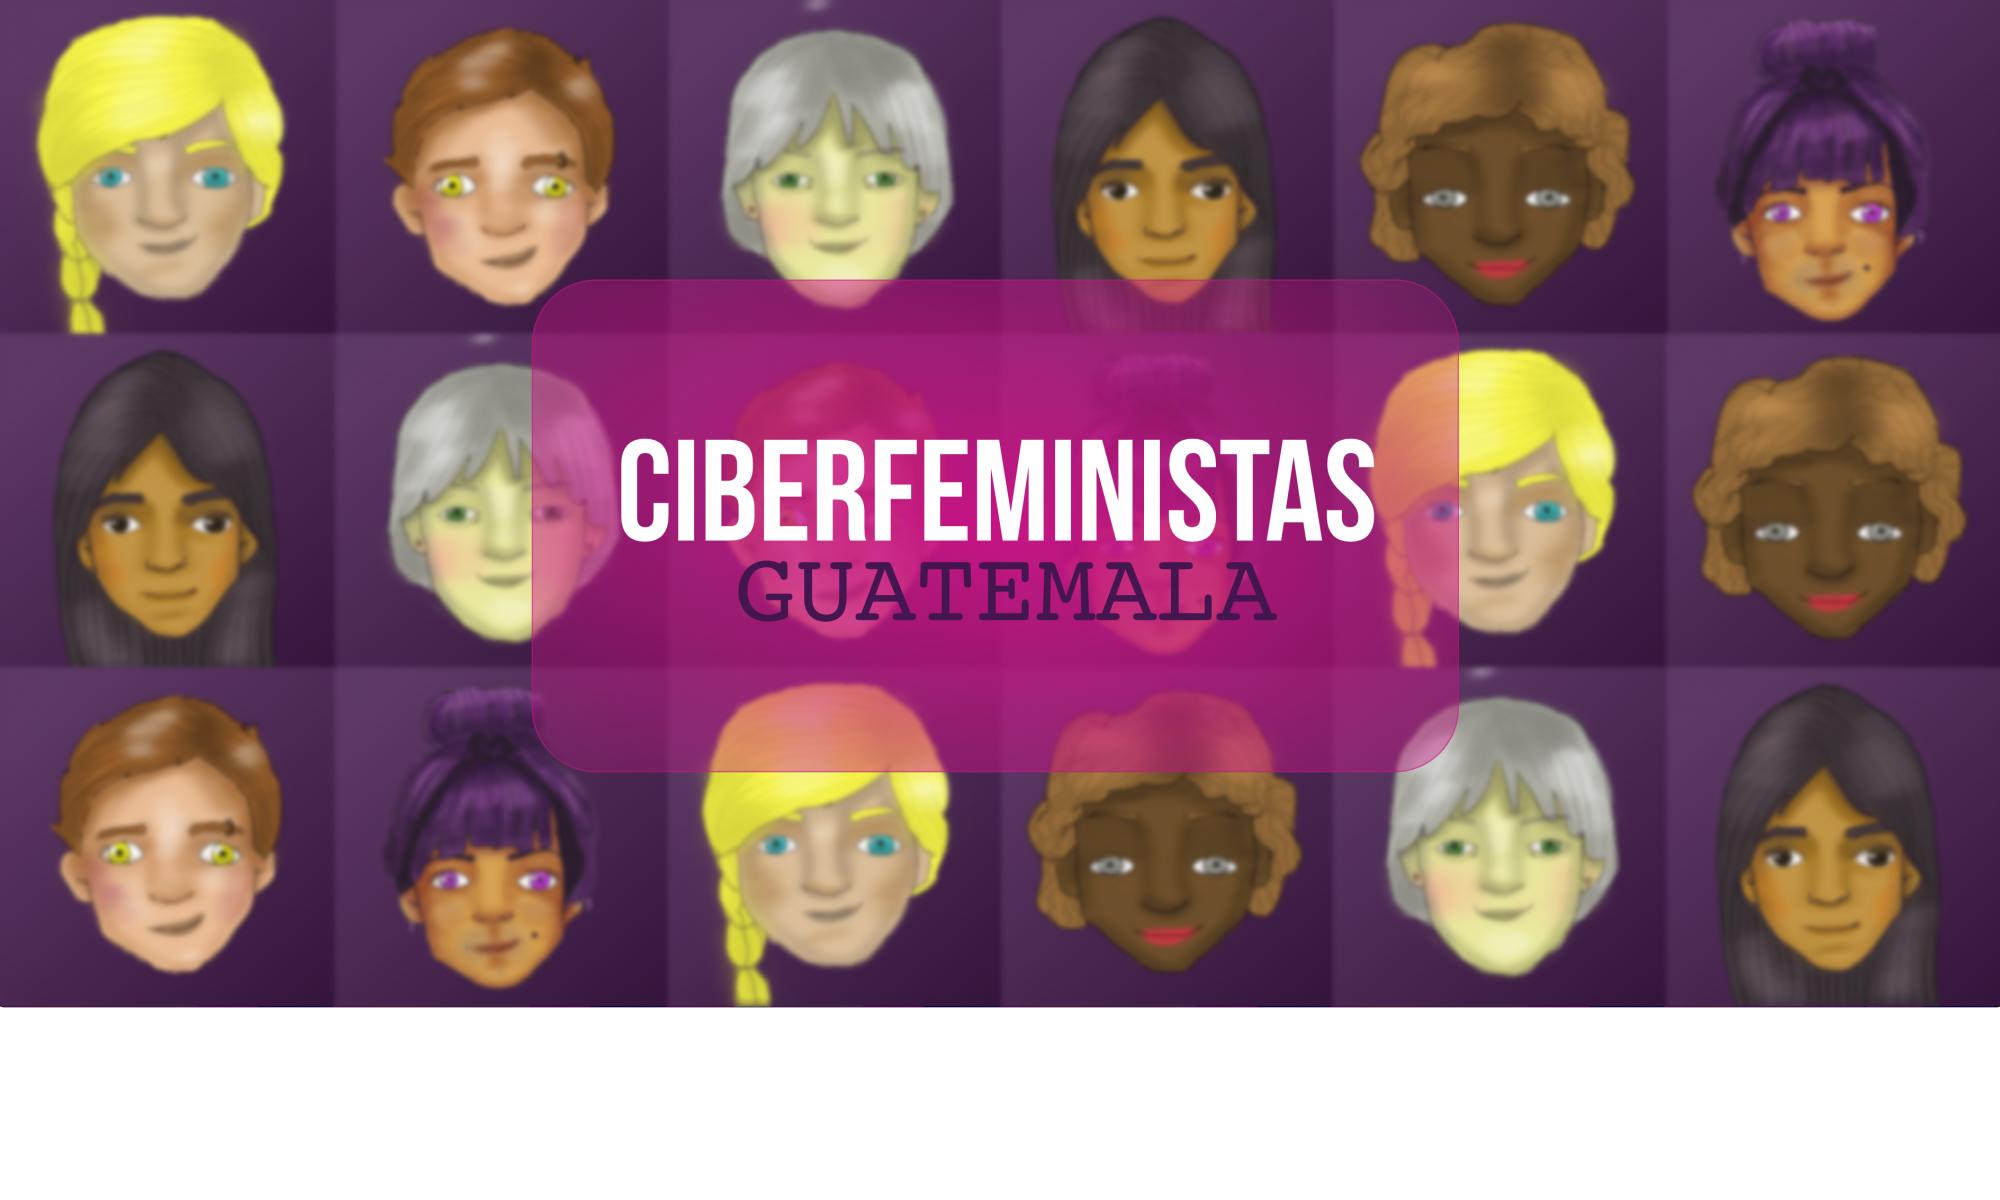 Ciberfeministas Guatemala